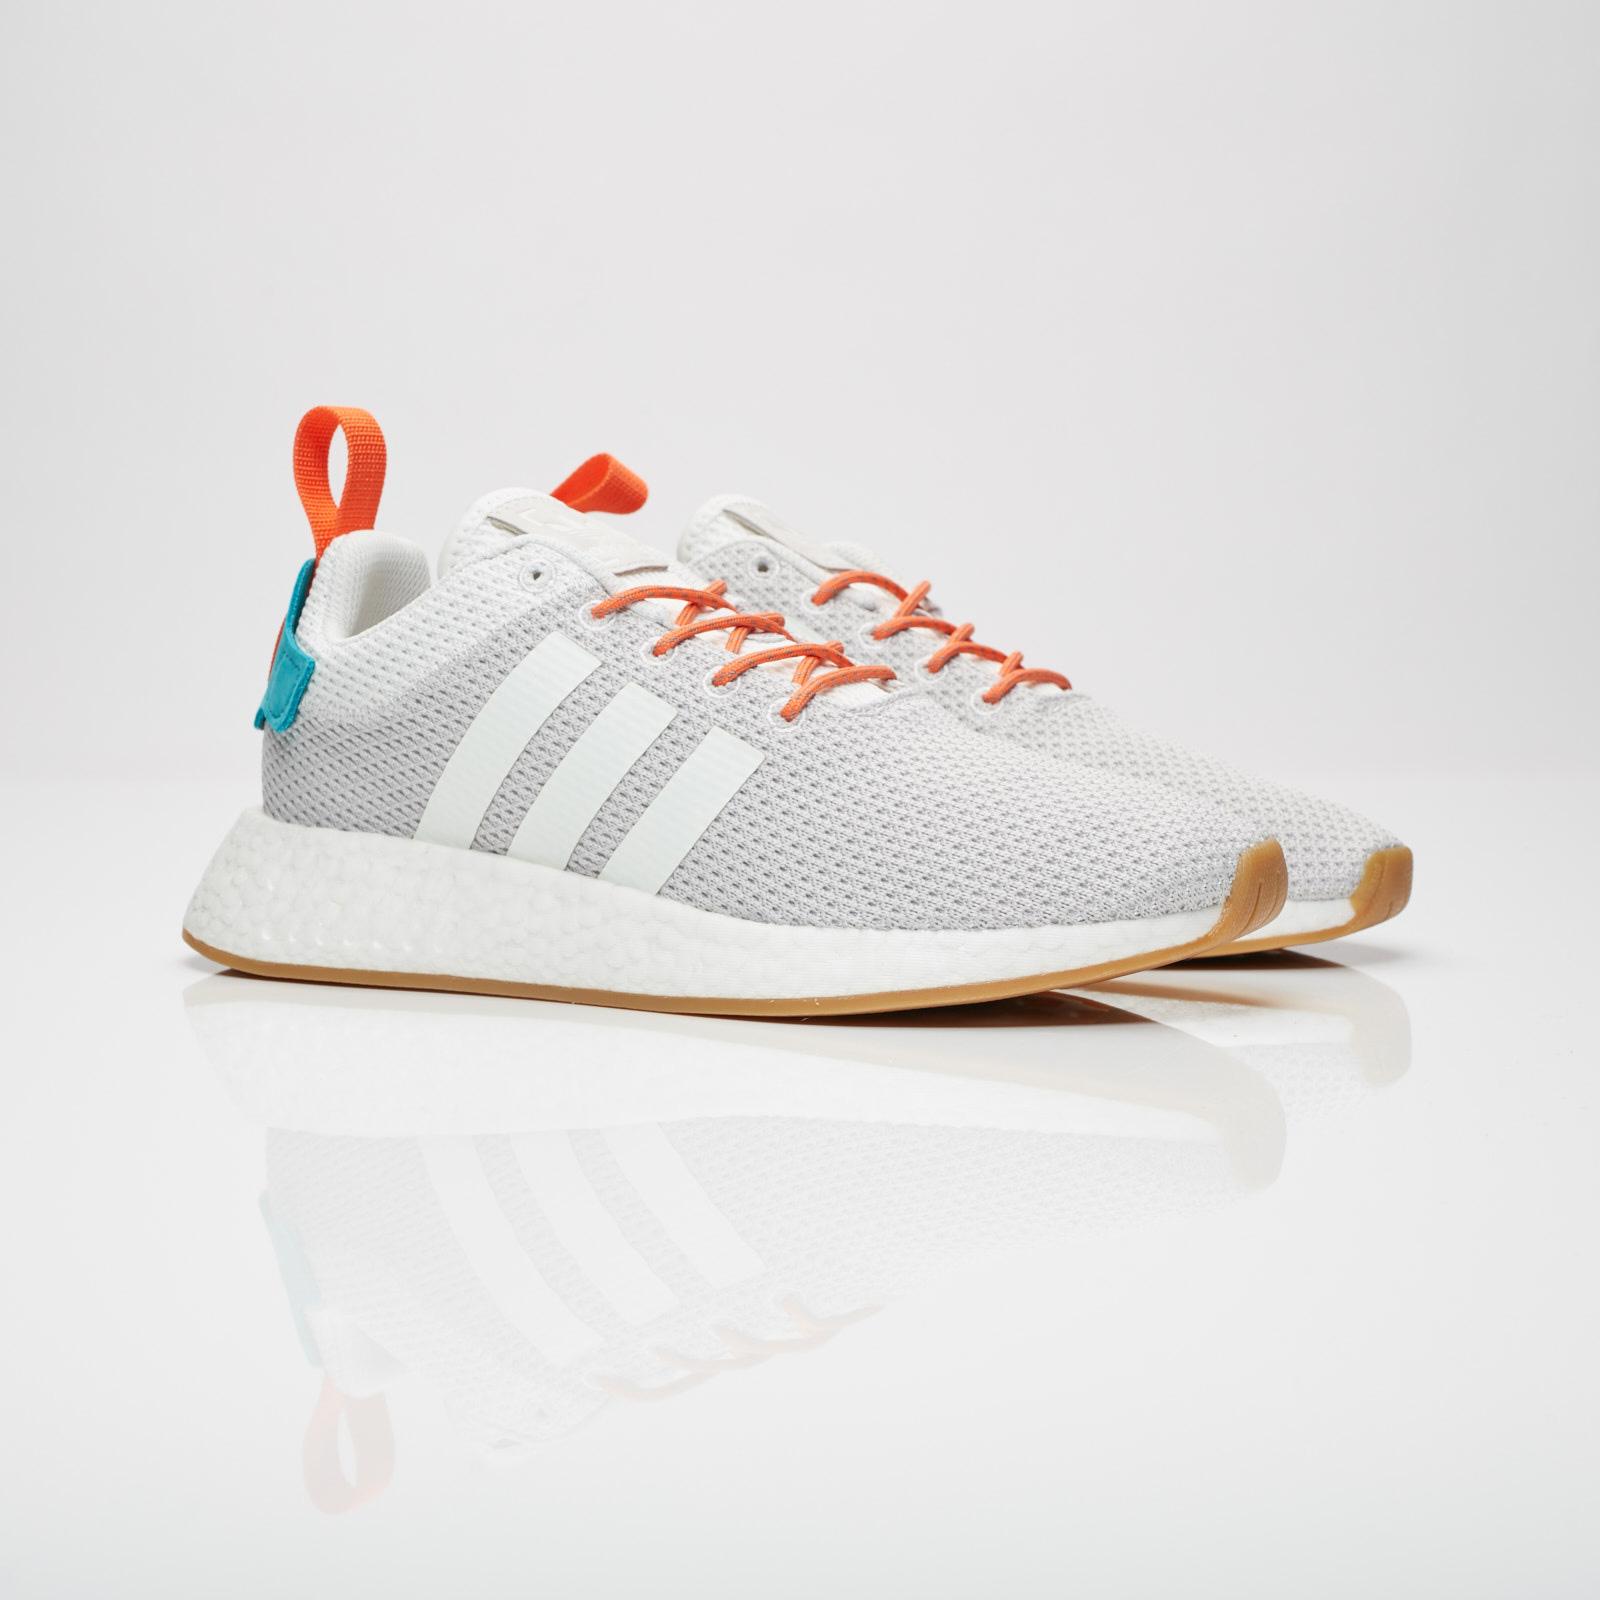 Adidas Nmd R2 Summer Cq3080 Sneakersnstuff Sneakers